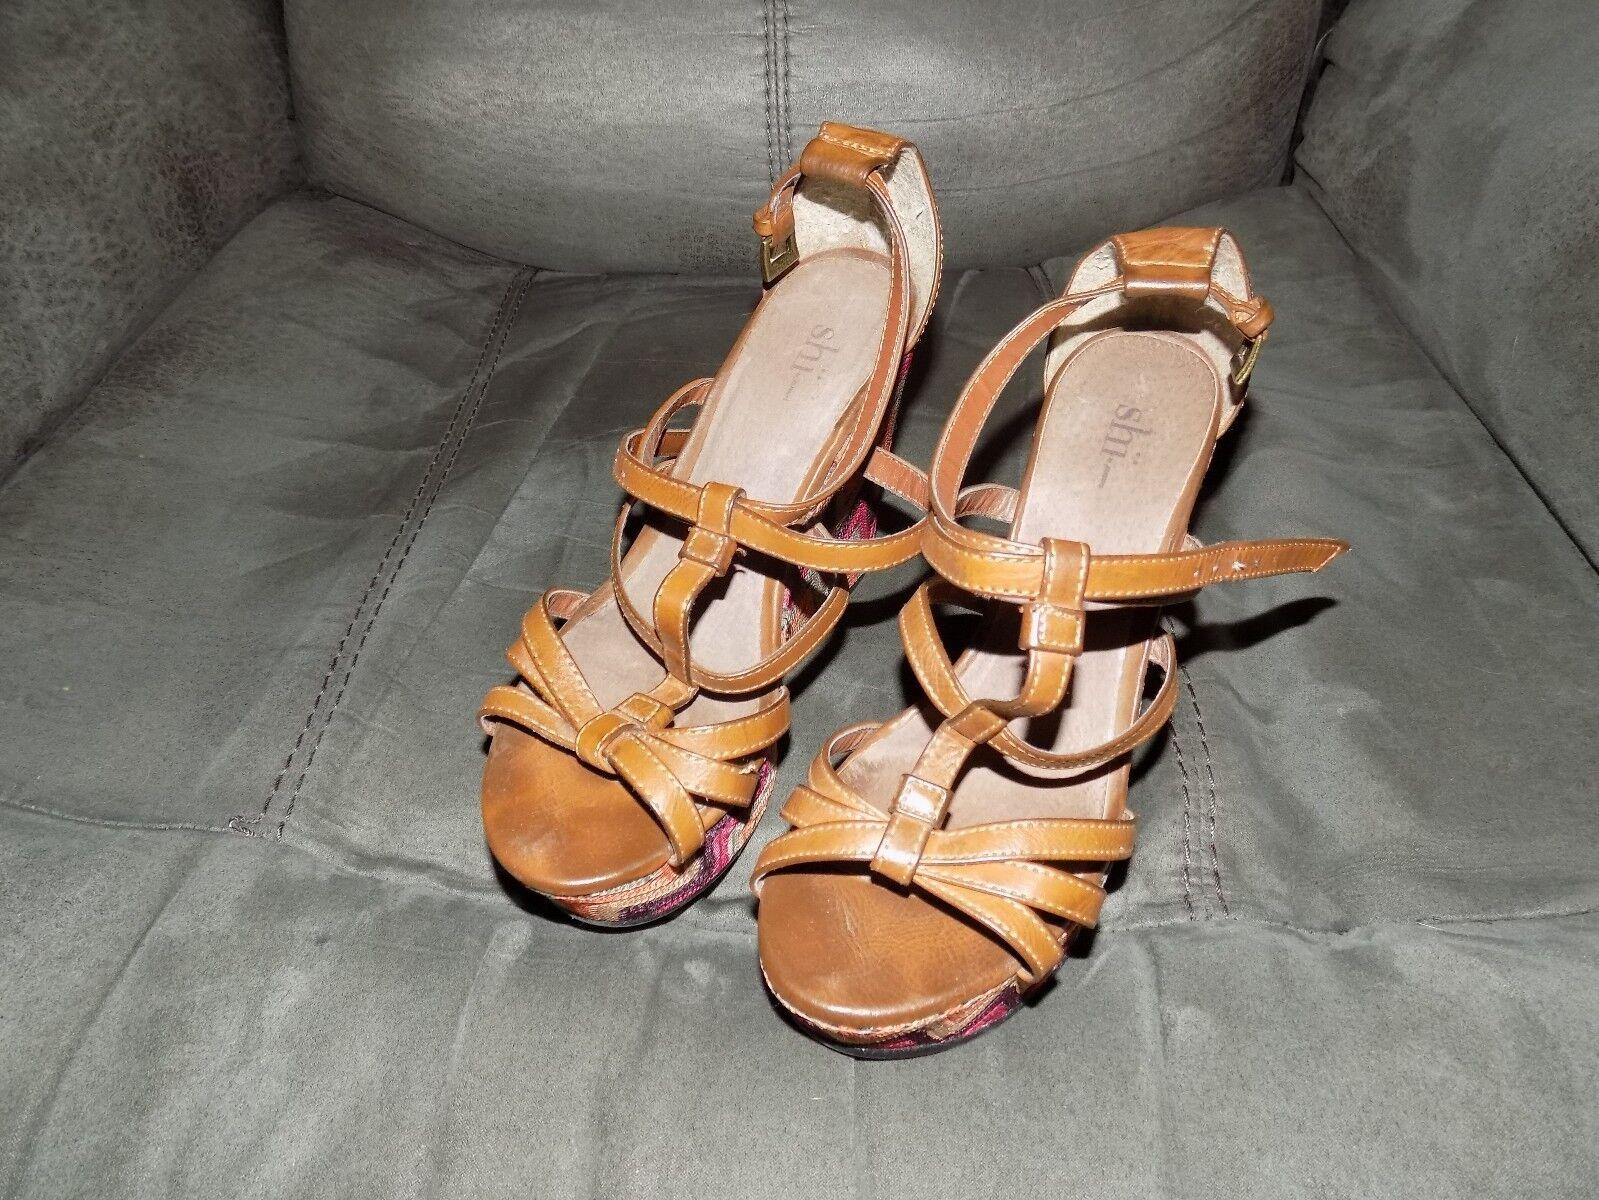 Shi By Journeys Chevron Design Wedge shoes Size 6.5 Women's EUC